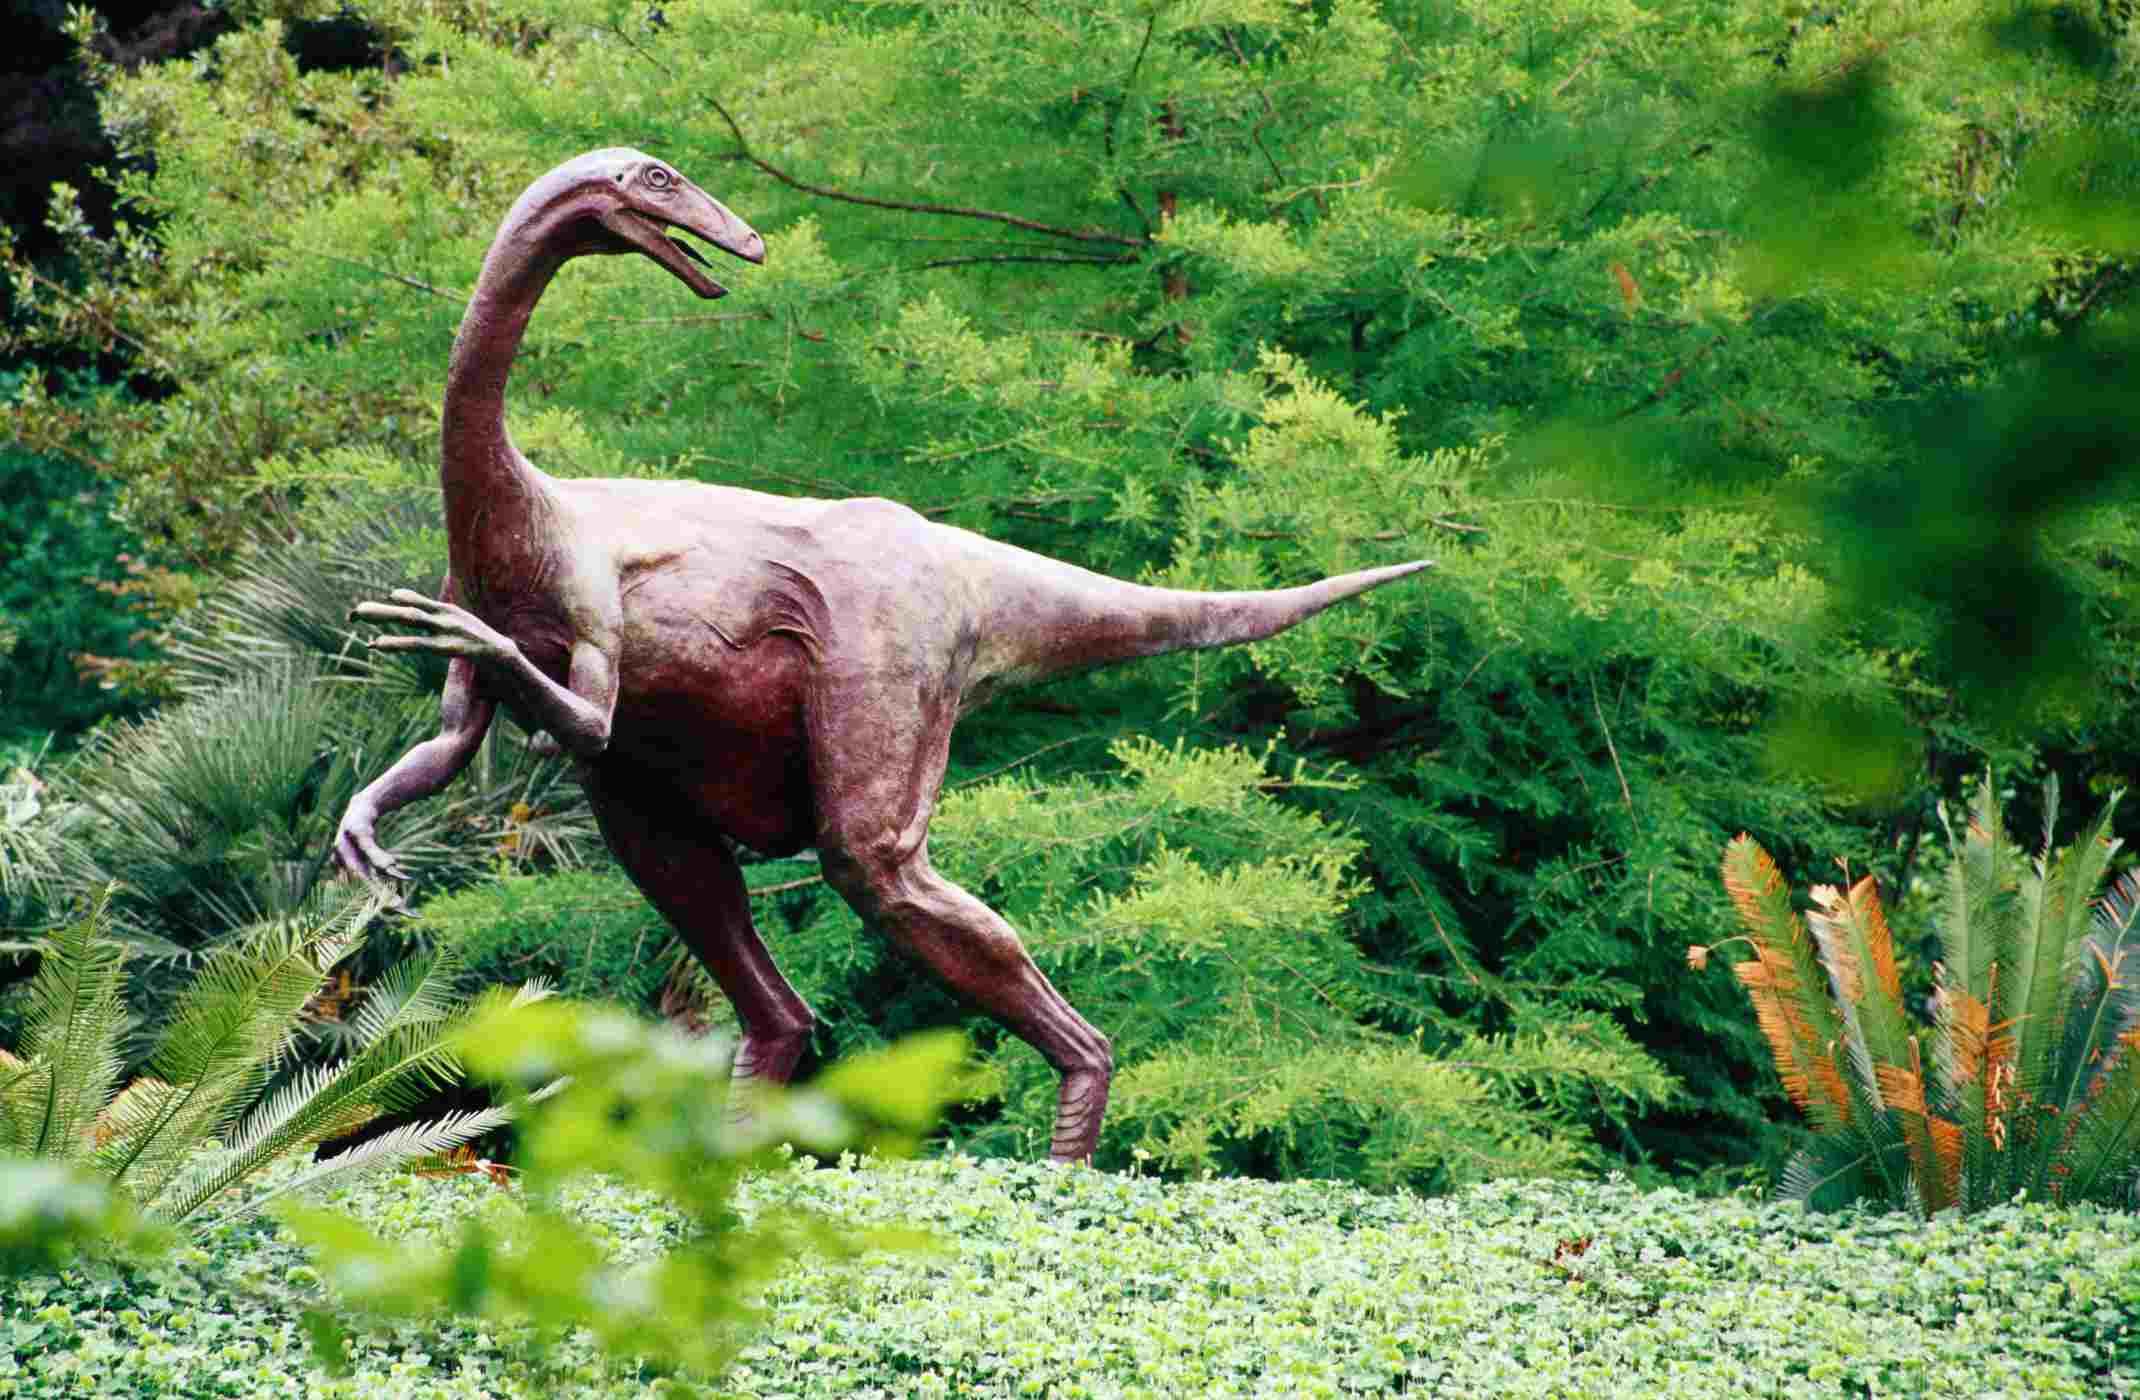 Ornithomimus dinosaur sculpture in Botanical Gardens, Zilker Park.